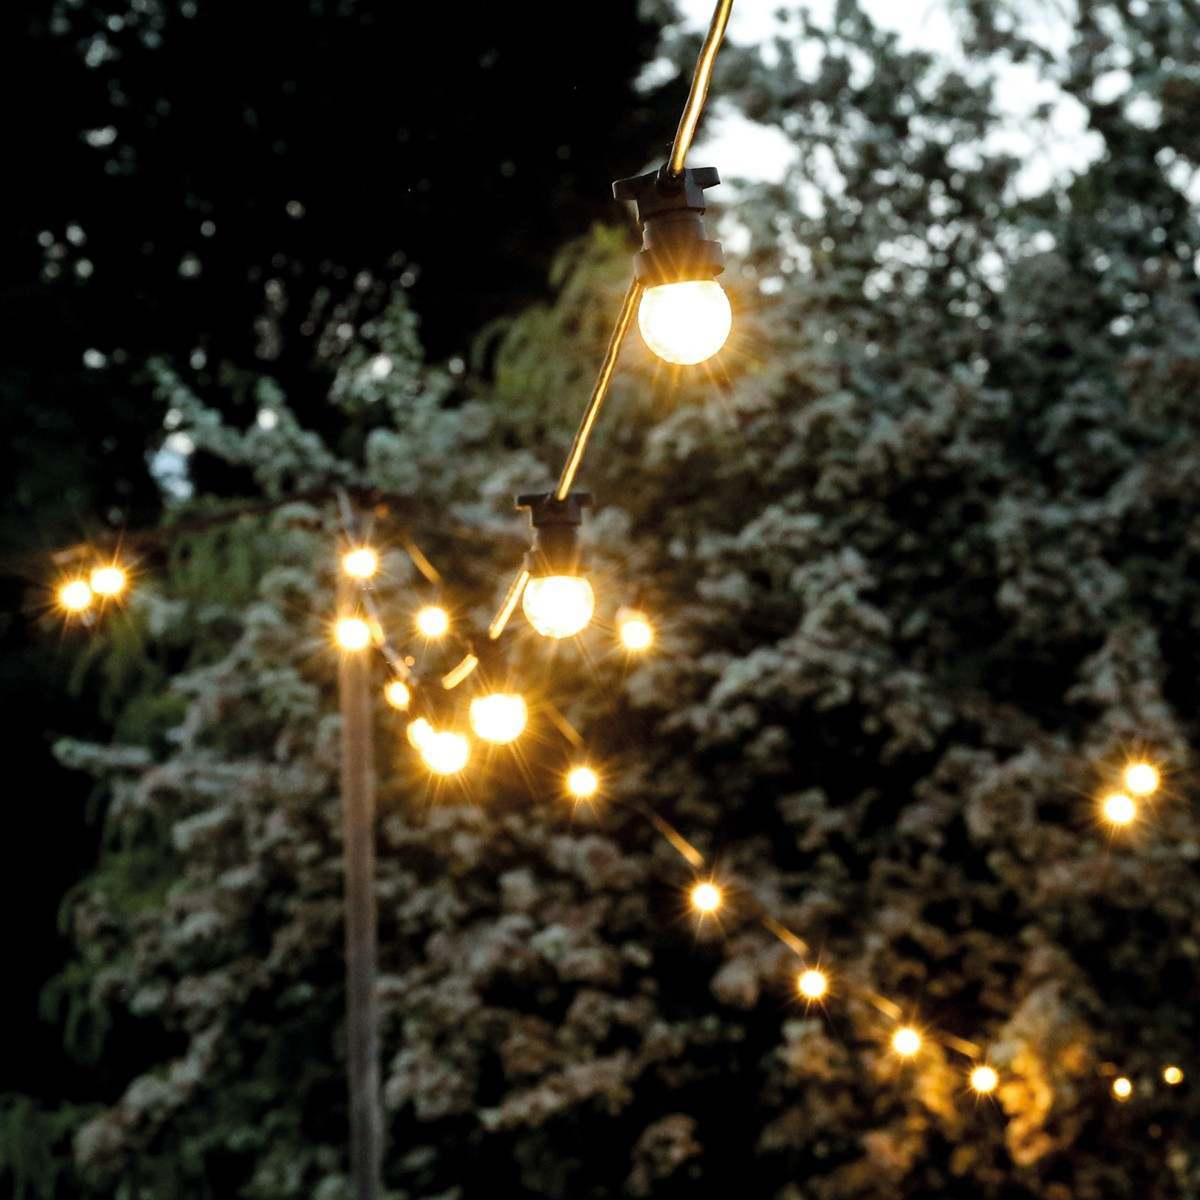 10m e27 festoon belt 20 sockets connectable - Guirlandes lumineuses exterieures solaires ...